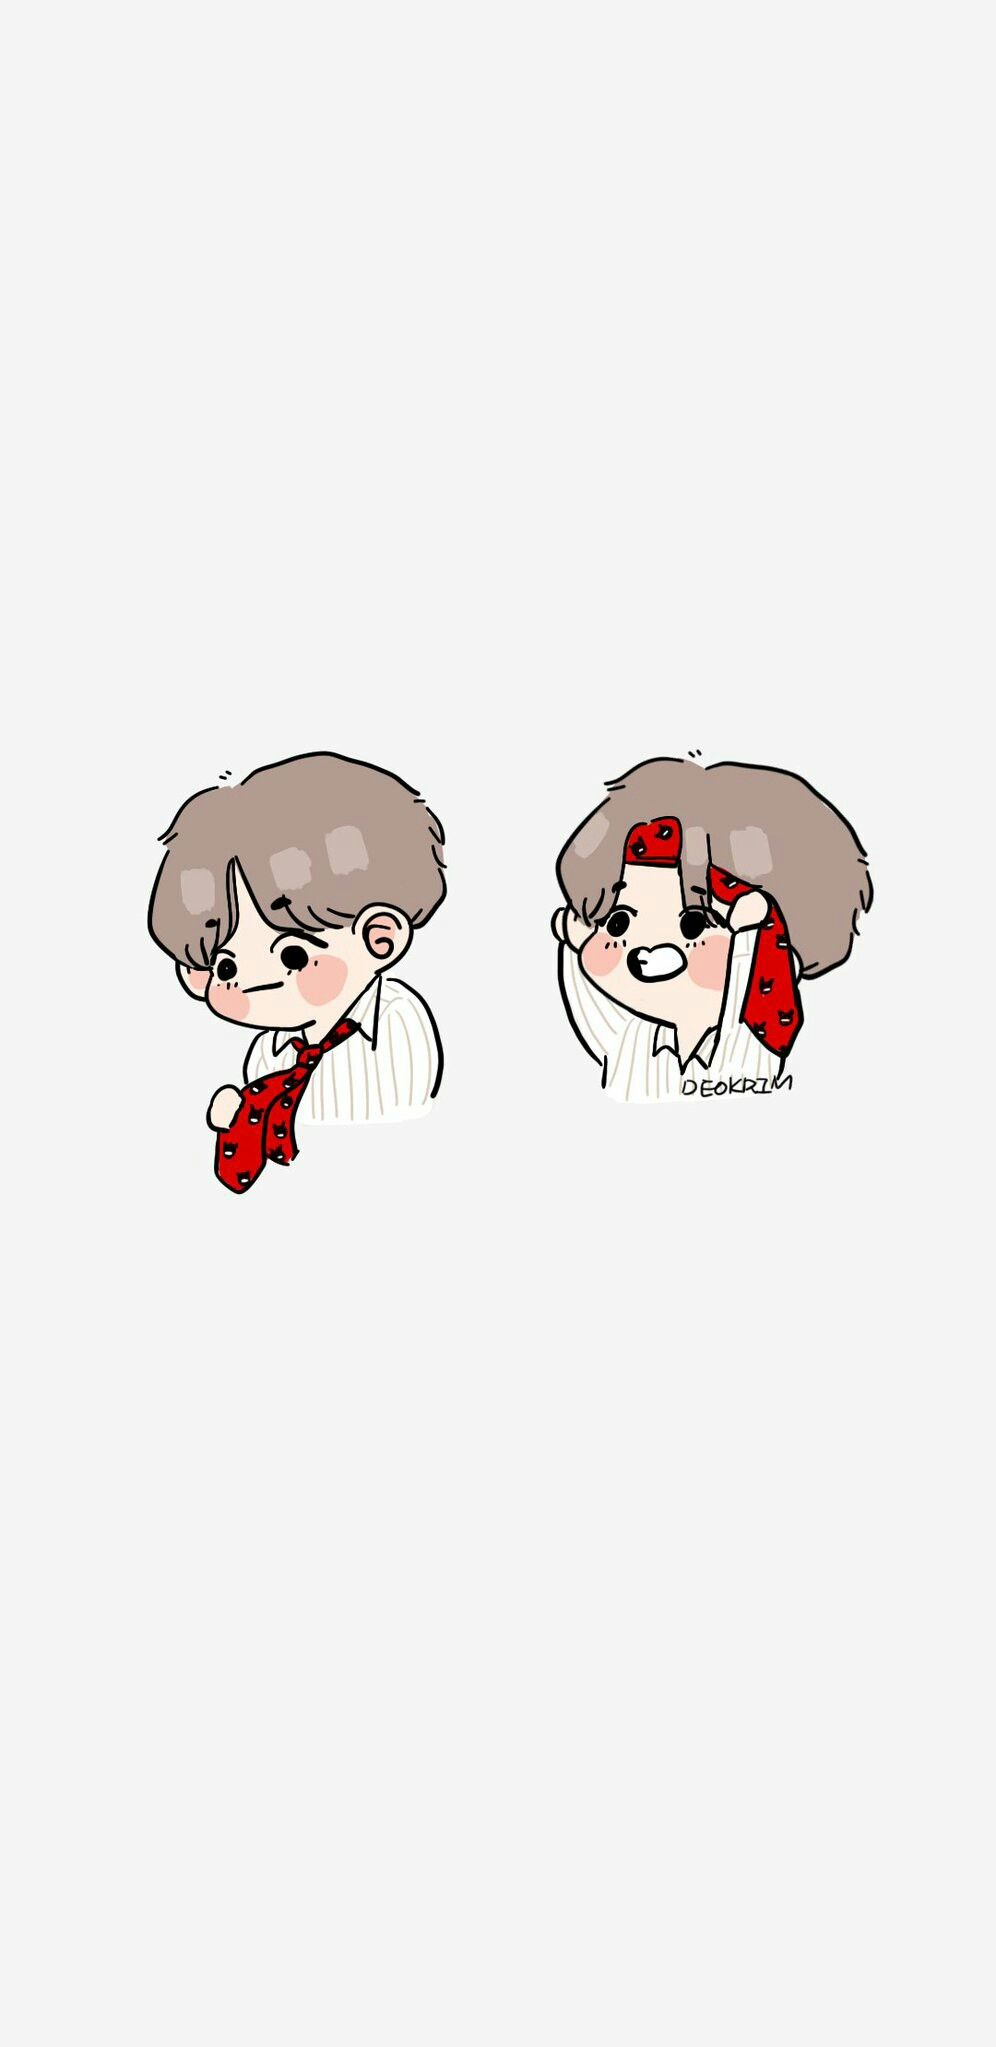 Cute Snoopy Wallpaper Iphone Taehyung Fanart ♡ Bts Bts Wallpaper Bts Fans V 224 Bts